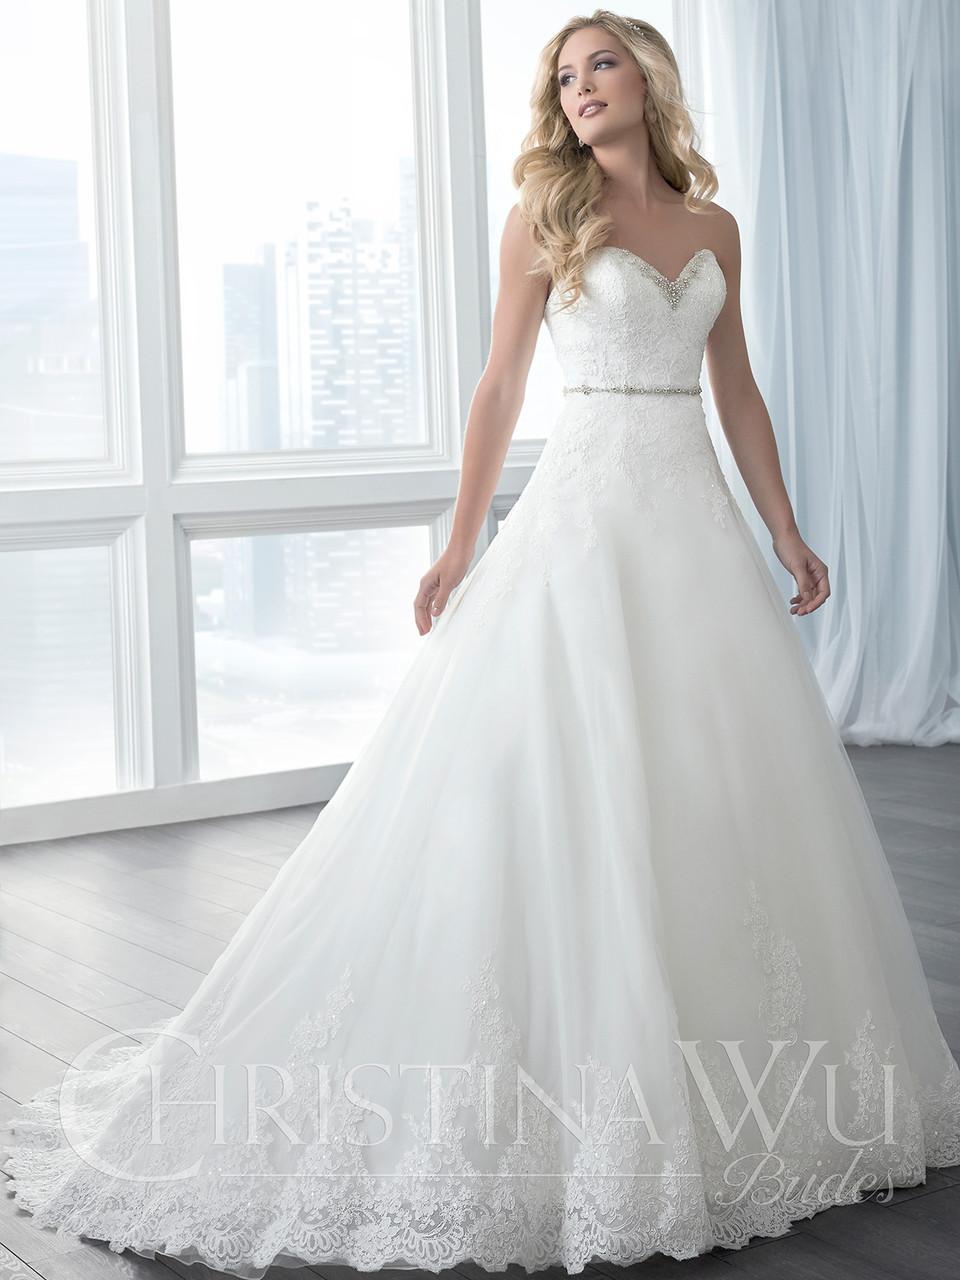 2a1b5db8fa3b Christina Wu 15619 Sweetheart A-line Wedding Dress - DimitraDesigns.com